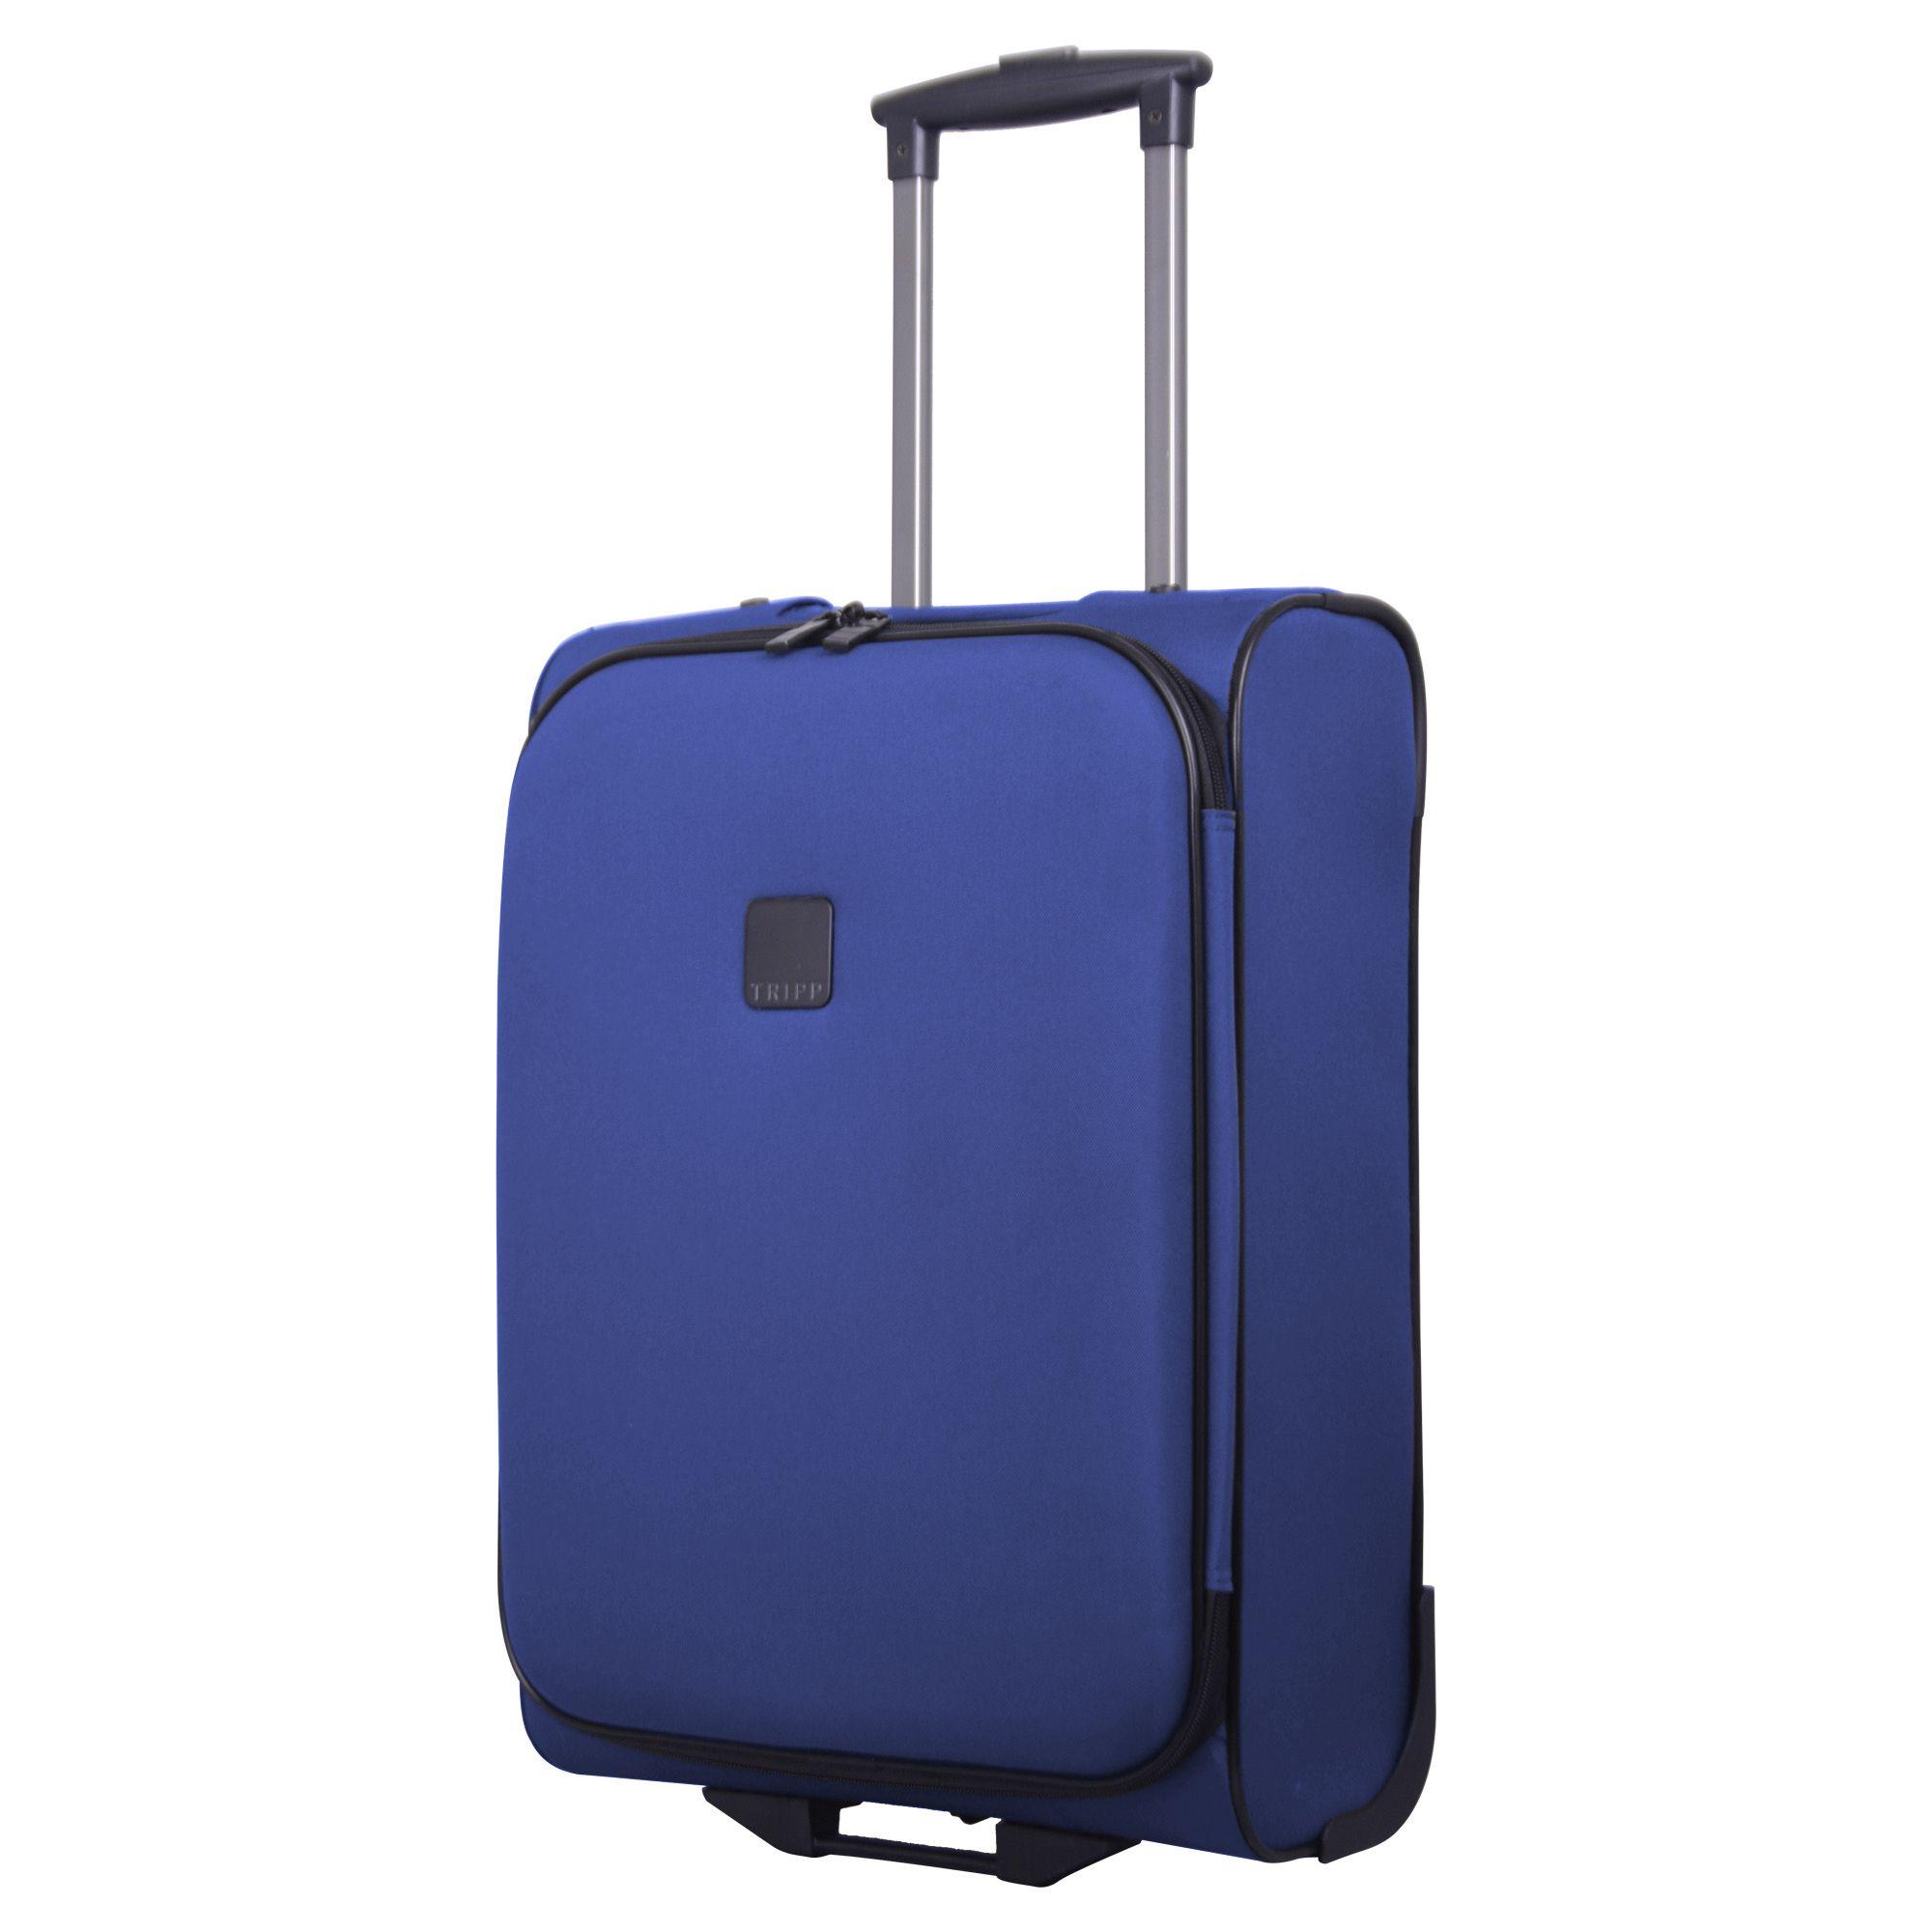 Tripp Sapphire Express 2w 2 Wheel Cabin Suitcase Soft